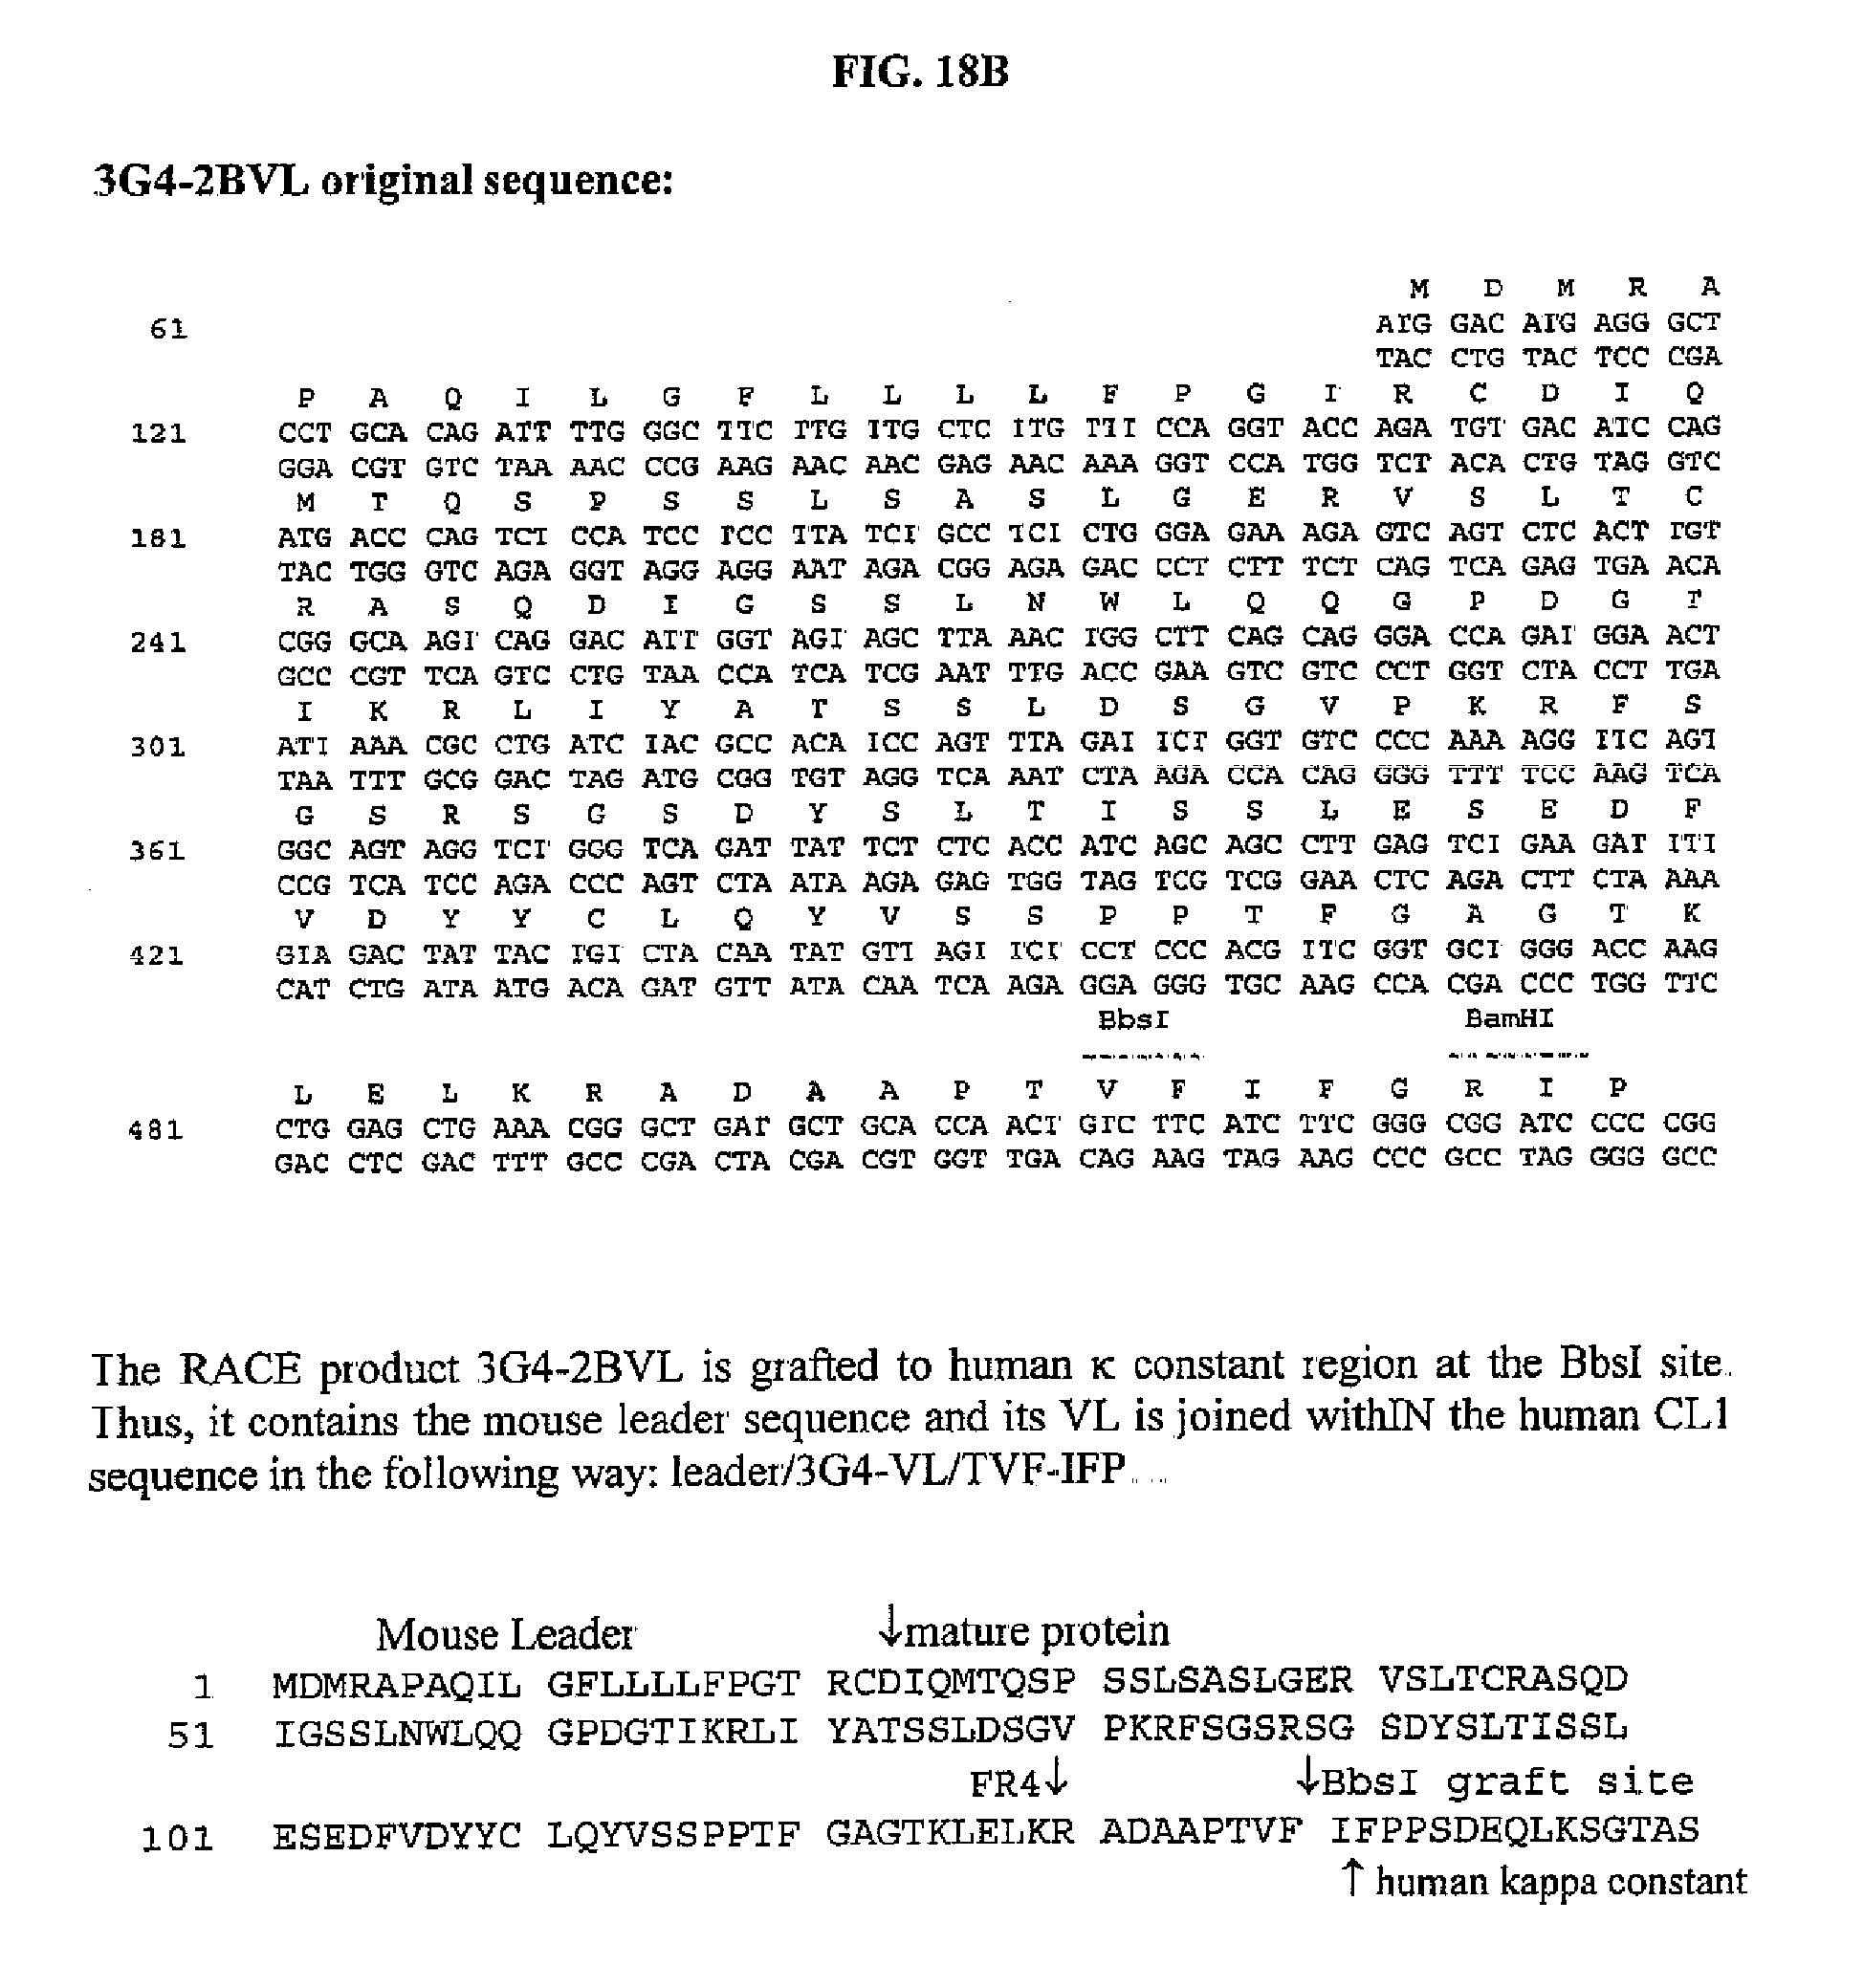 complimentary strand to cgt ctc ttc gga cac Answers for constructing a protein lab dna agc tac tta ctc acc ata mrna ucg mrna cug cac ugg uau ccg gga uuu ugc.